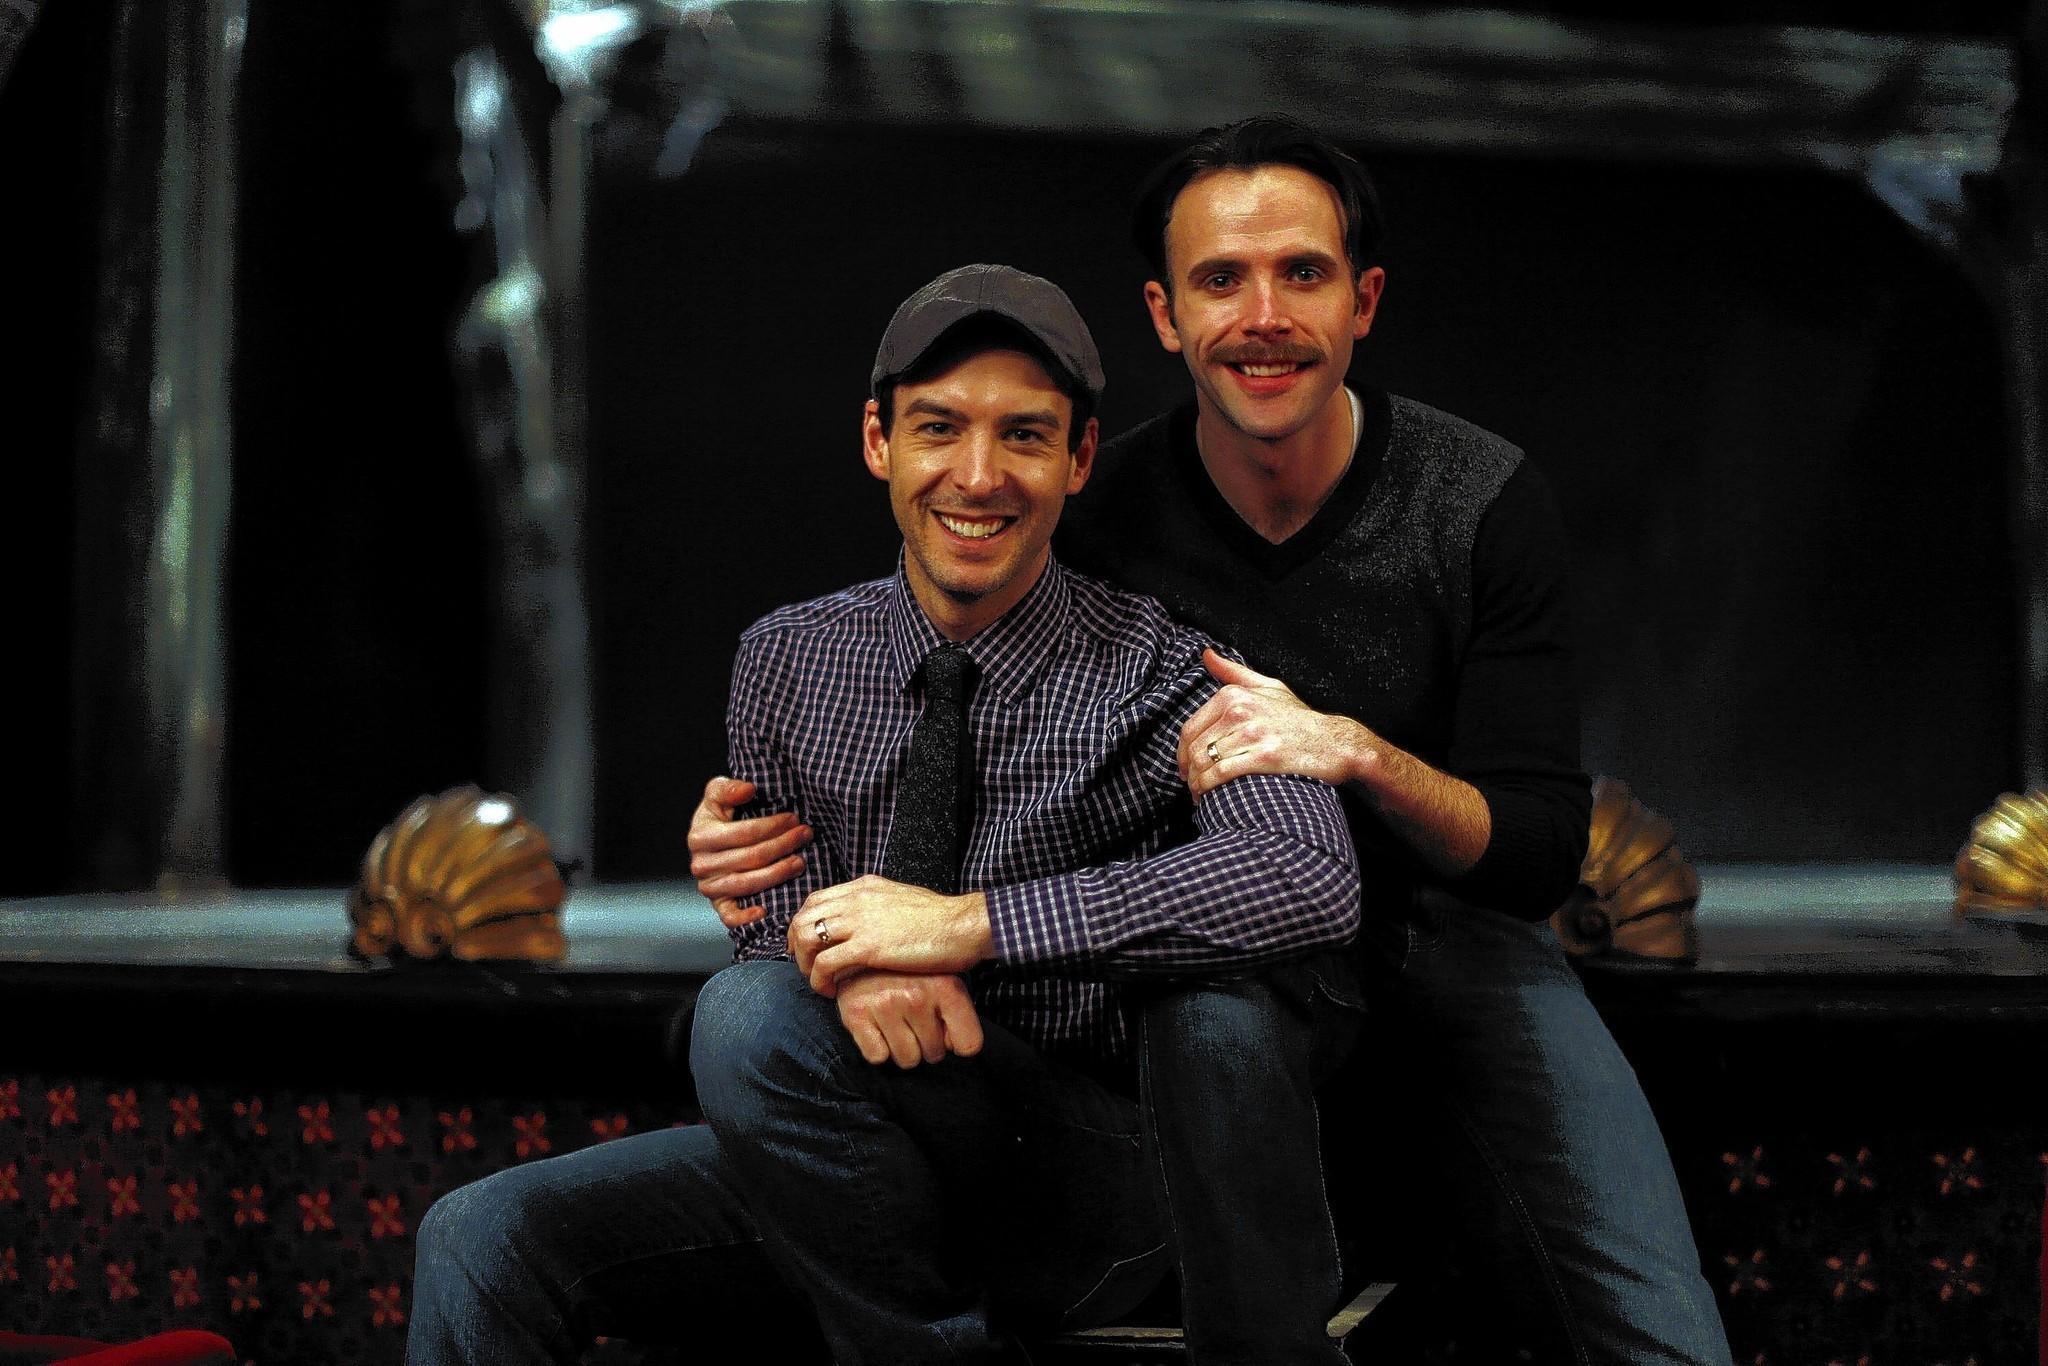 Stephen Schellhardt (left) and Devin DeSantis at the Drury Lane Theater in Oak Brook, Ill.